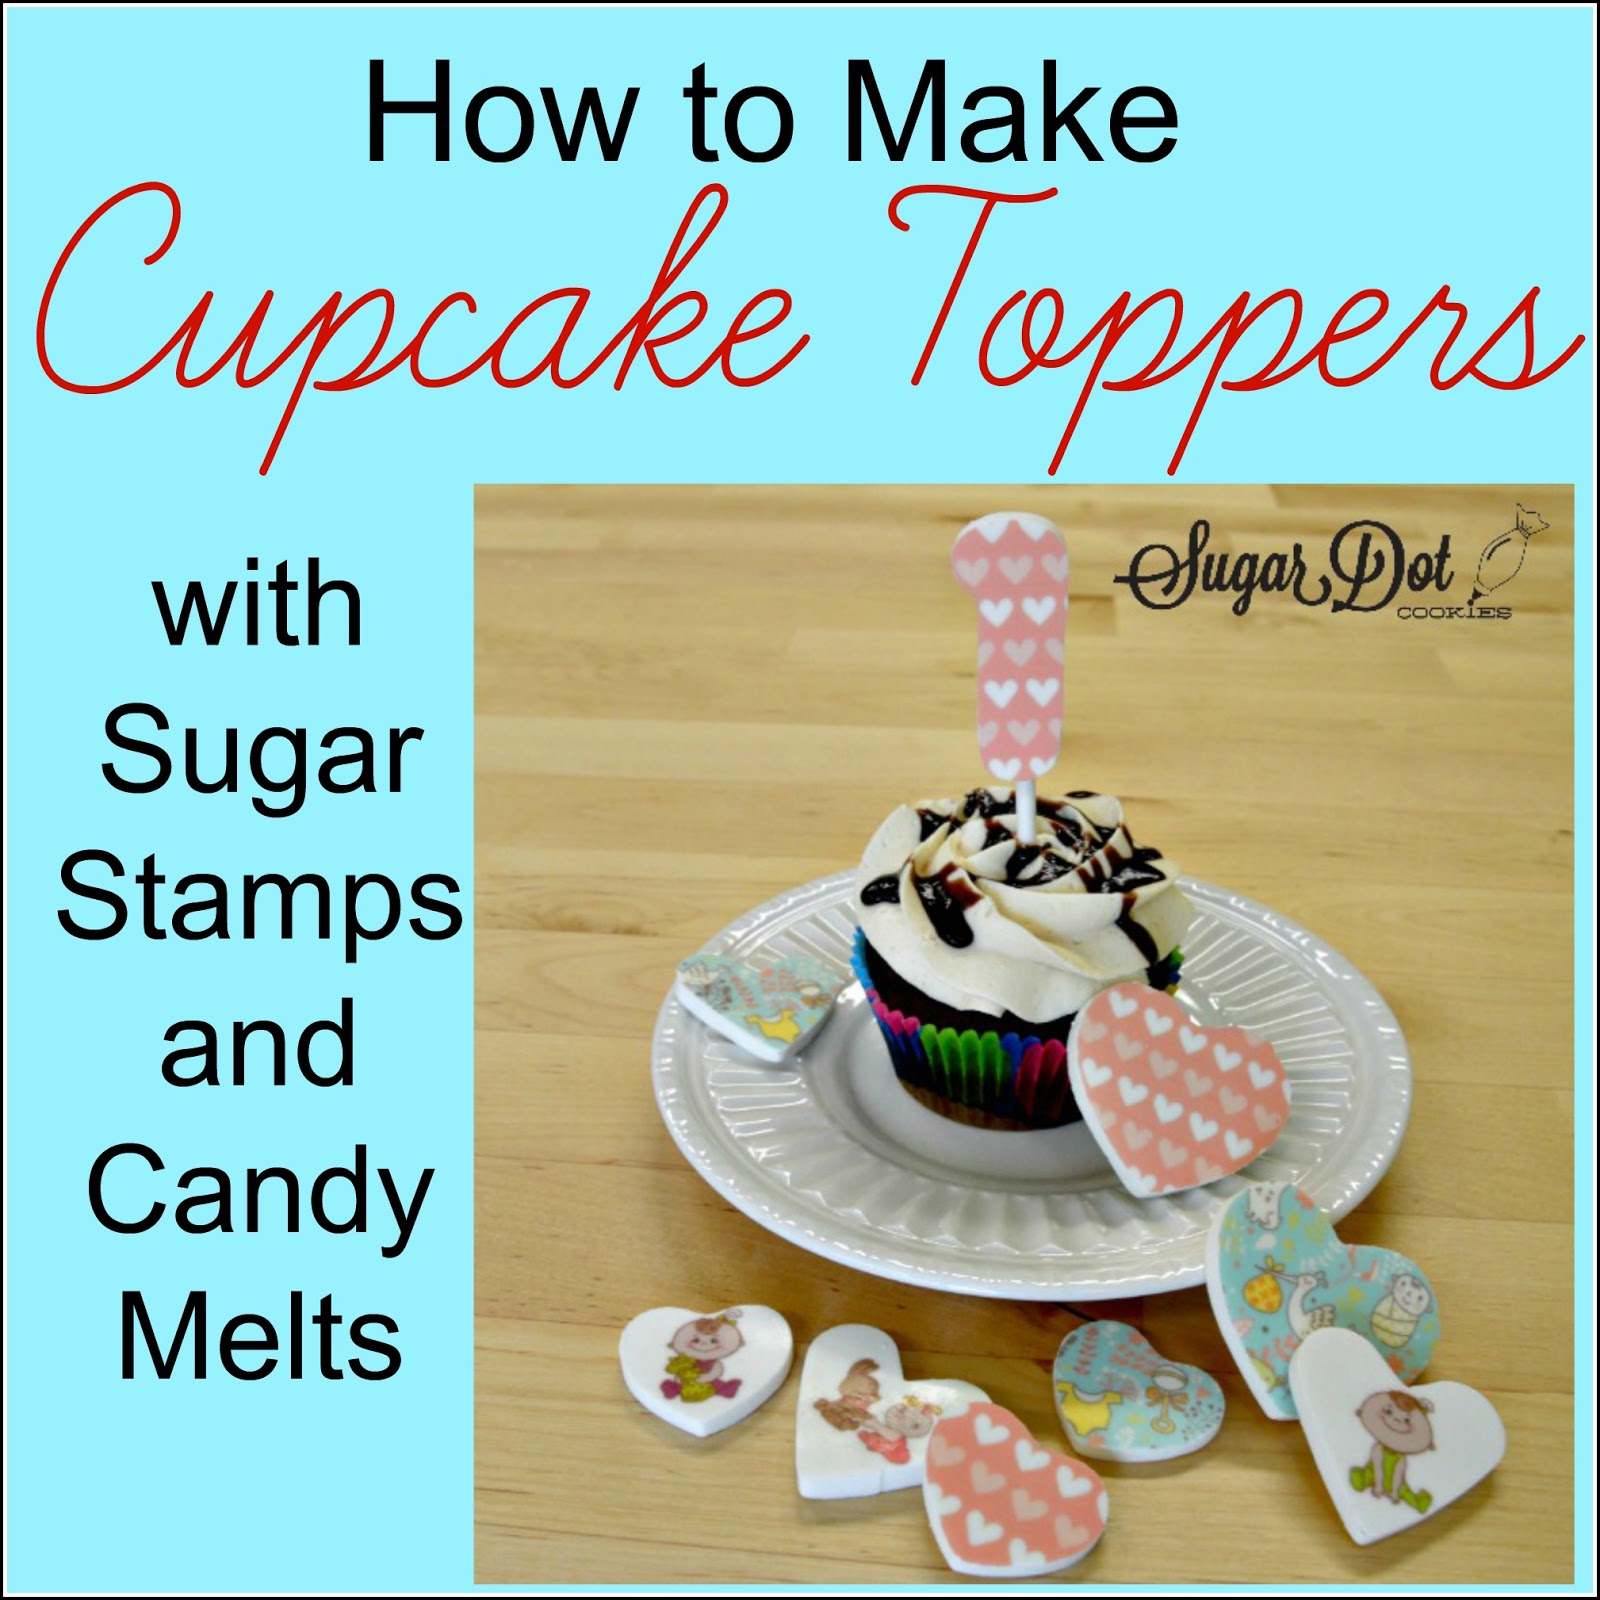 sugar dot cookies tutorial how to make candy melt cupcake